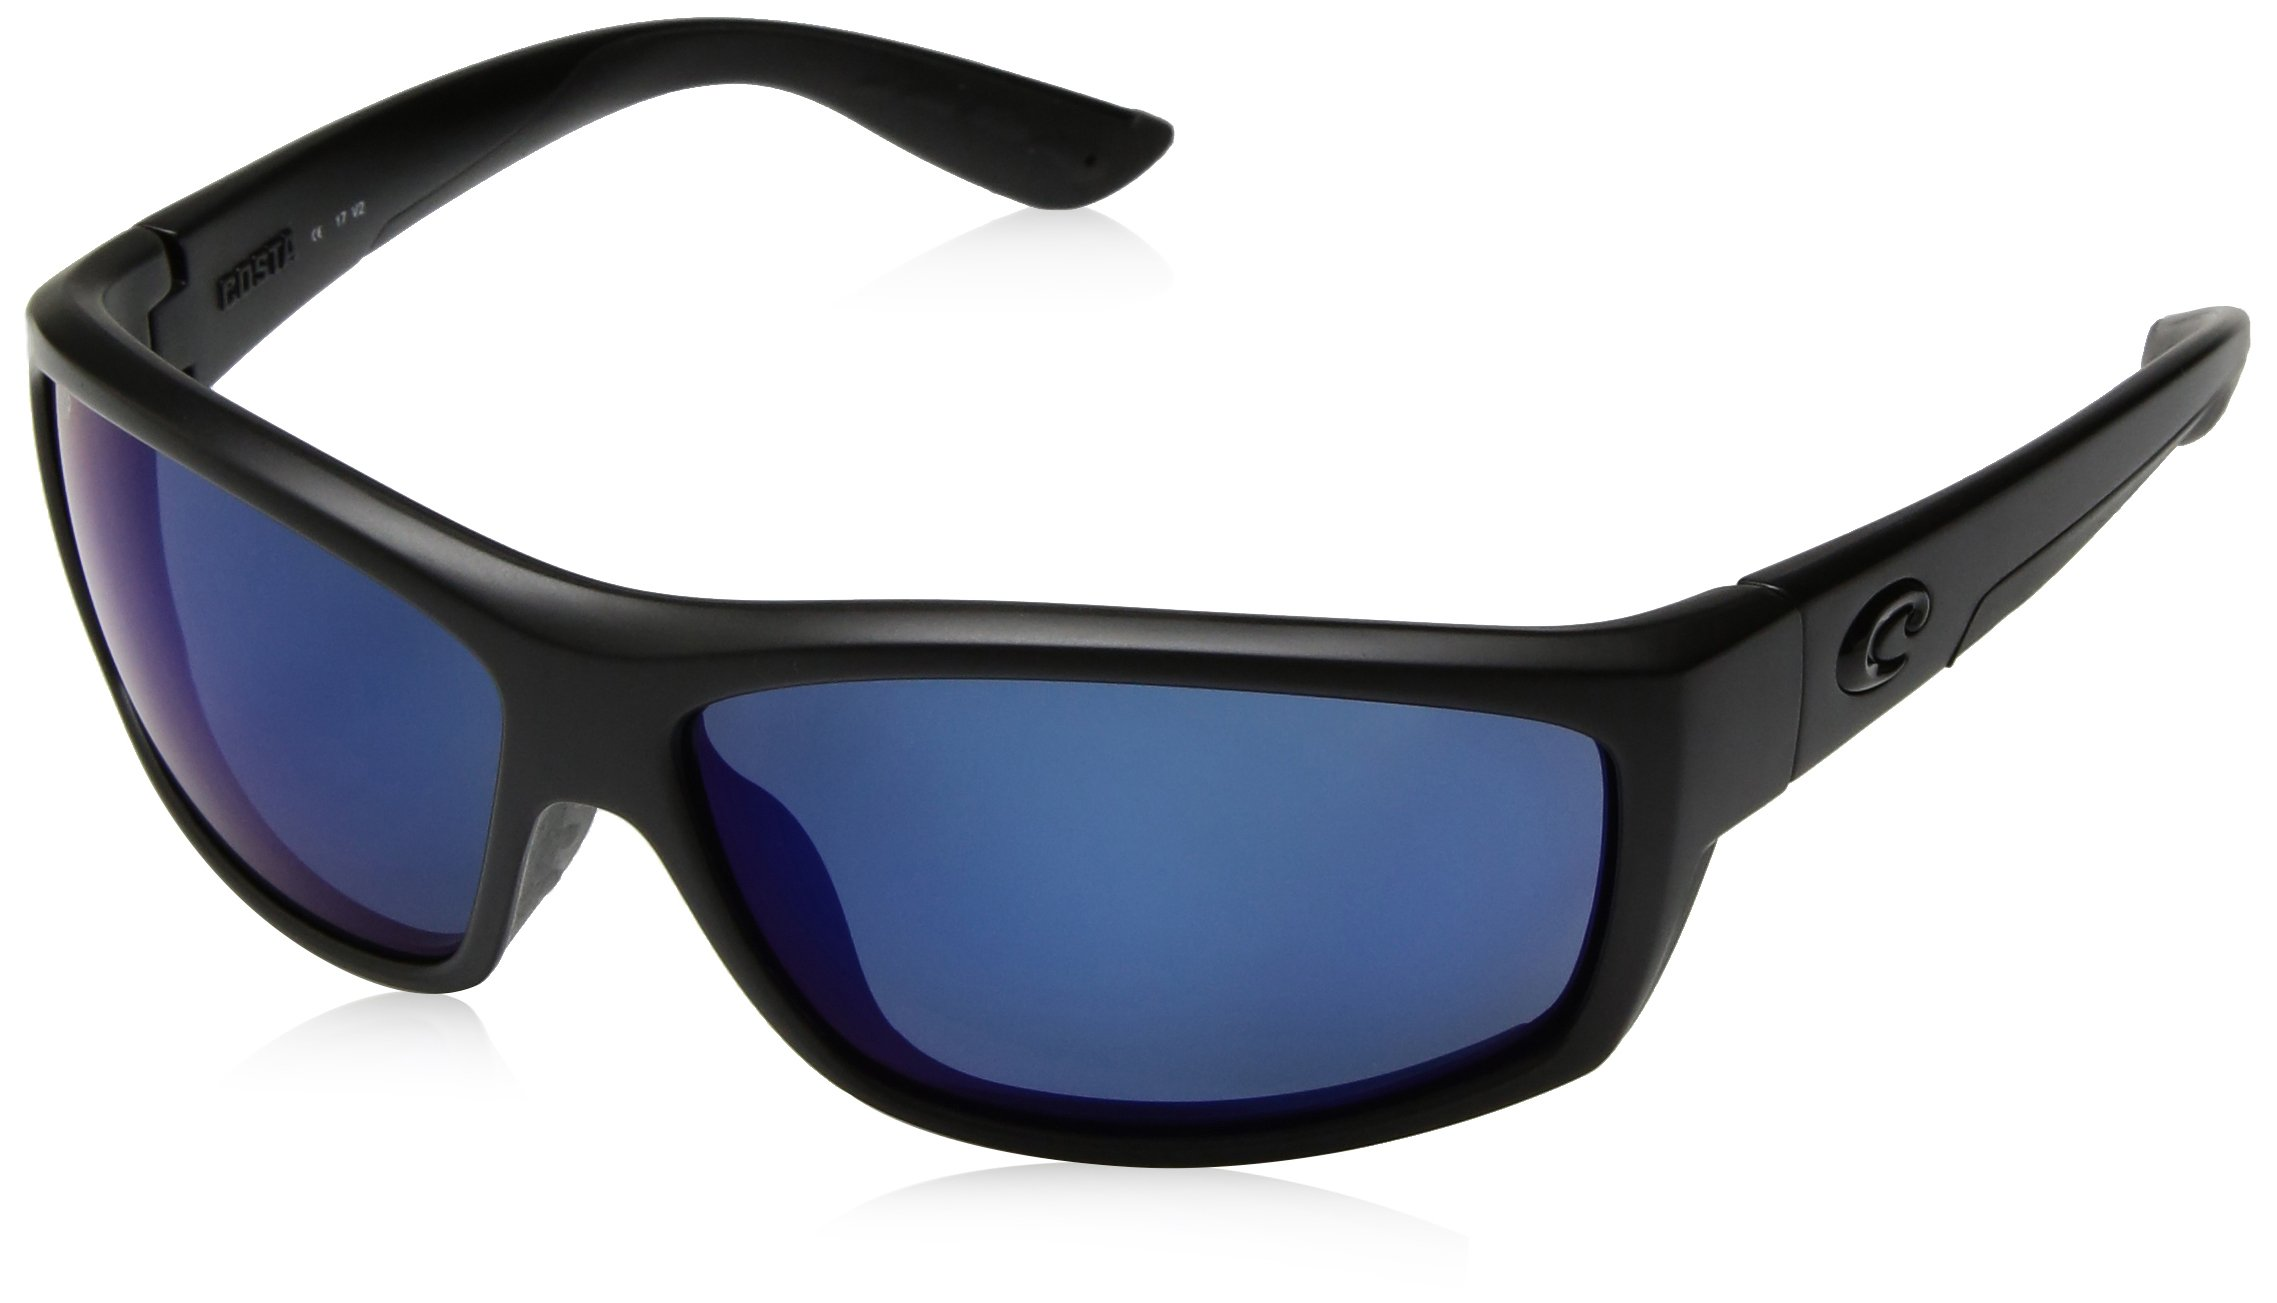 Costa del Mar Men's Saltbreak Polarized Iridium Plastic Oval Sunglasses, Blackout/Blue Mirror, 64.6 mm